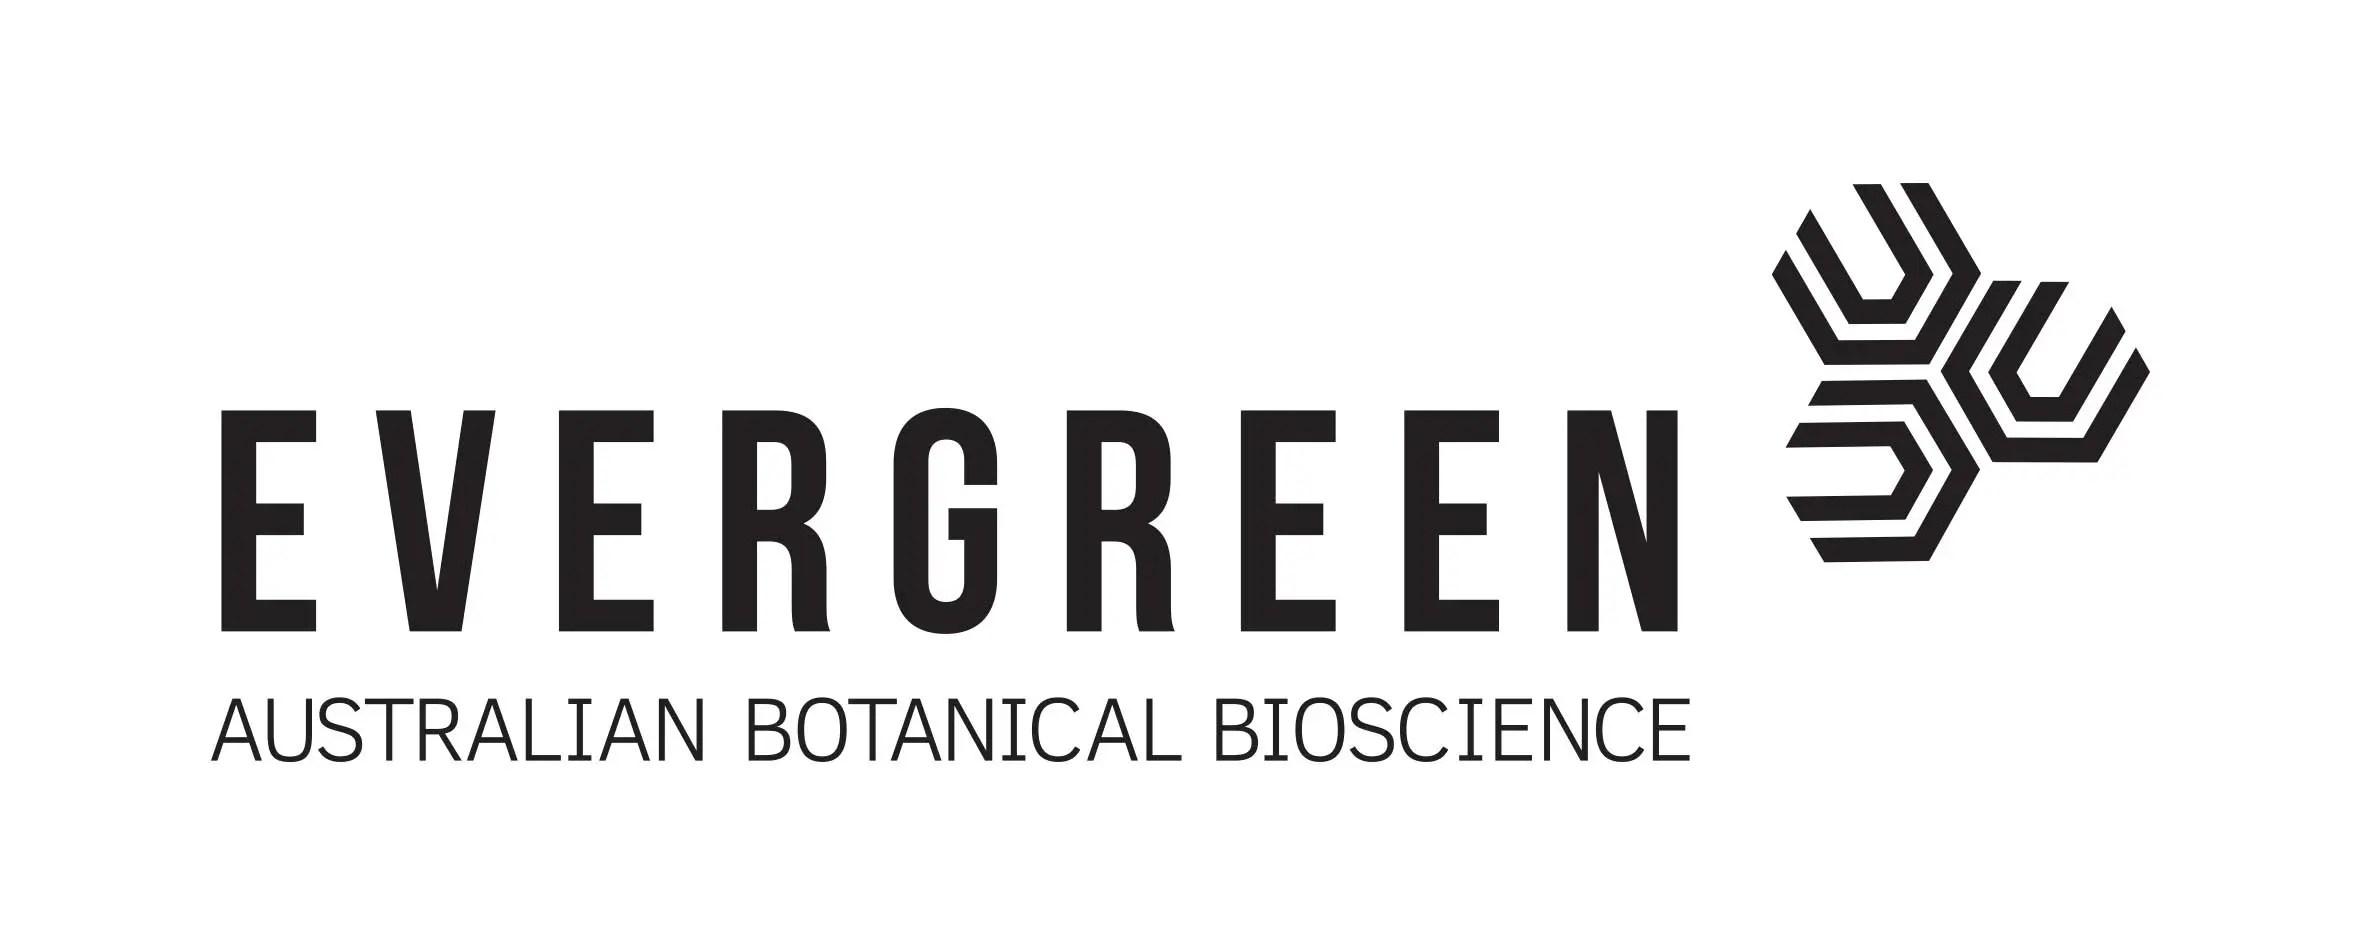 Evergreen Australian Botanical Bioscience